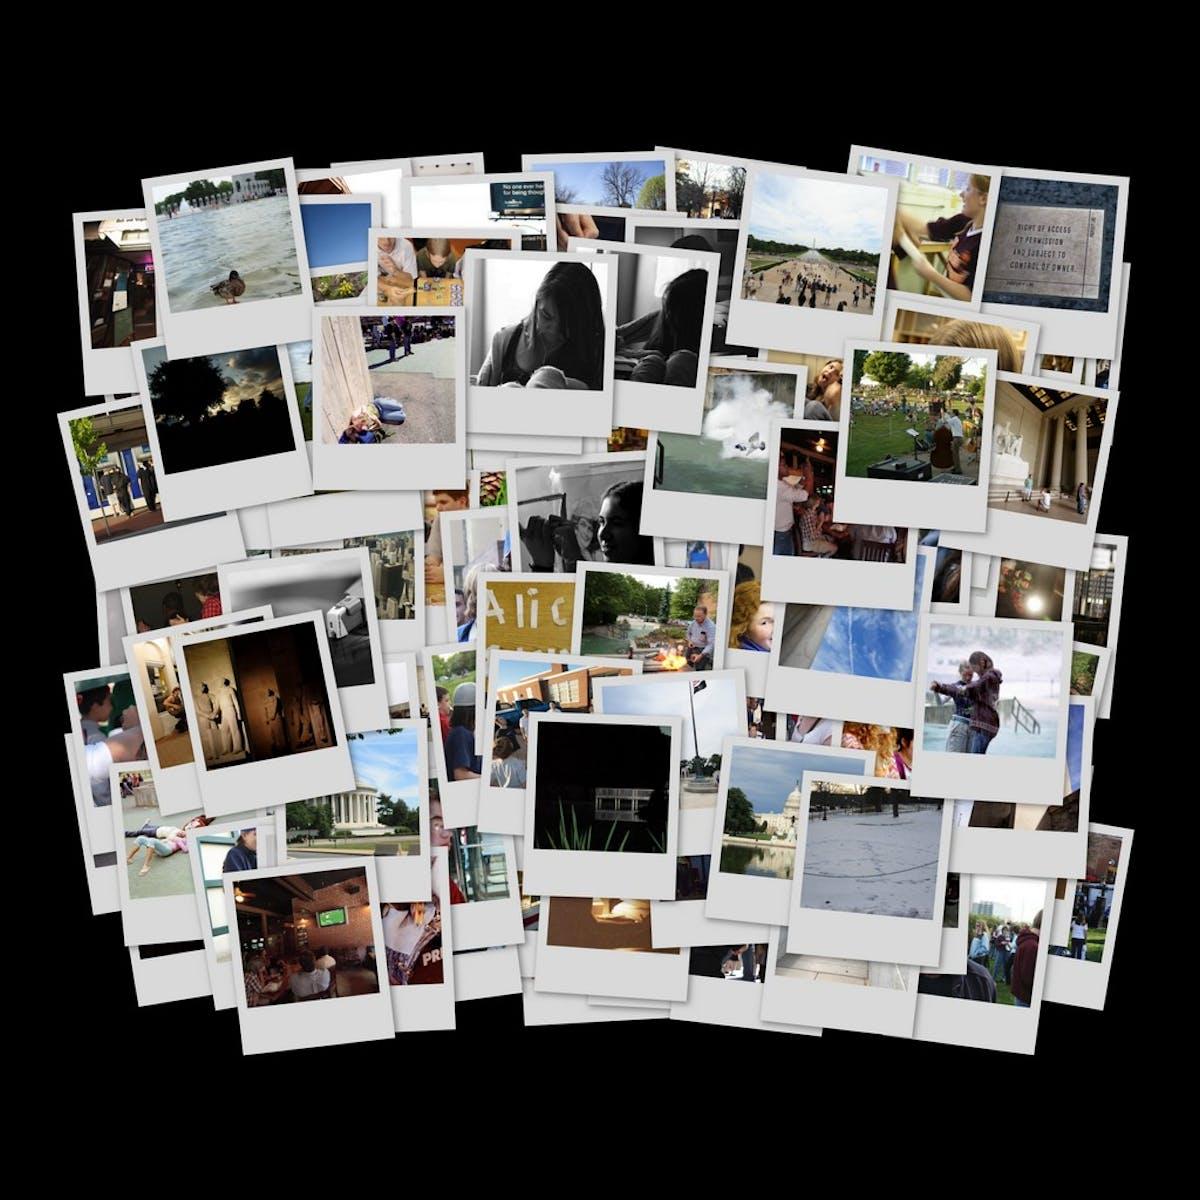 Google Photos: How to Use Google's A I -Powered Photos